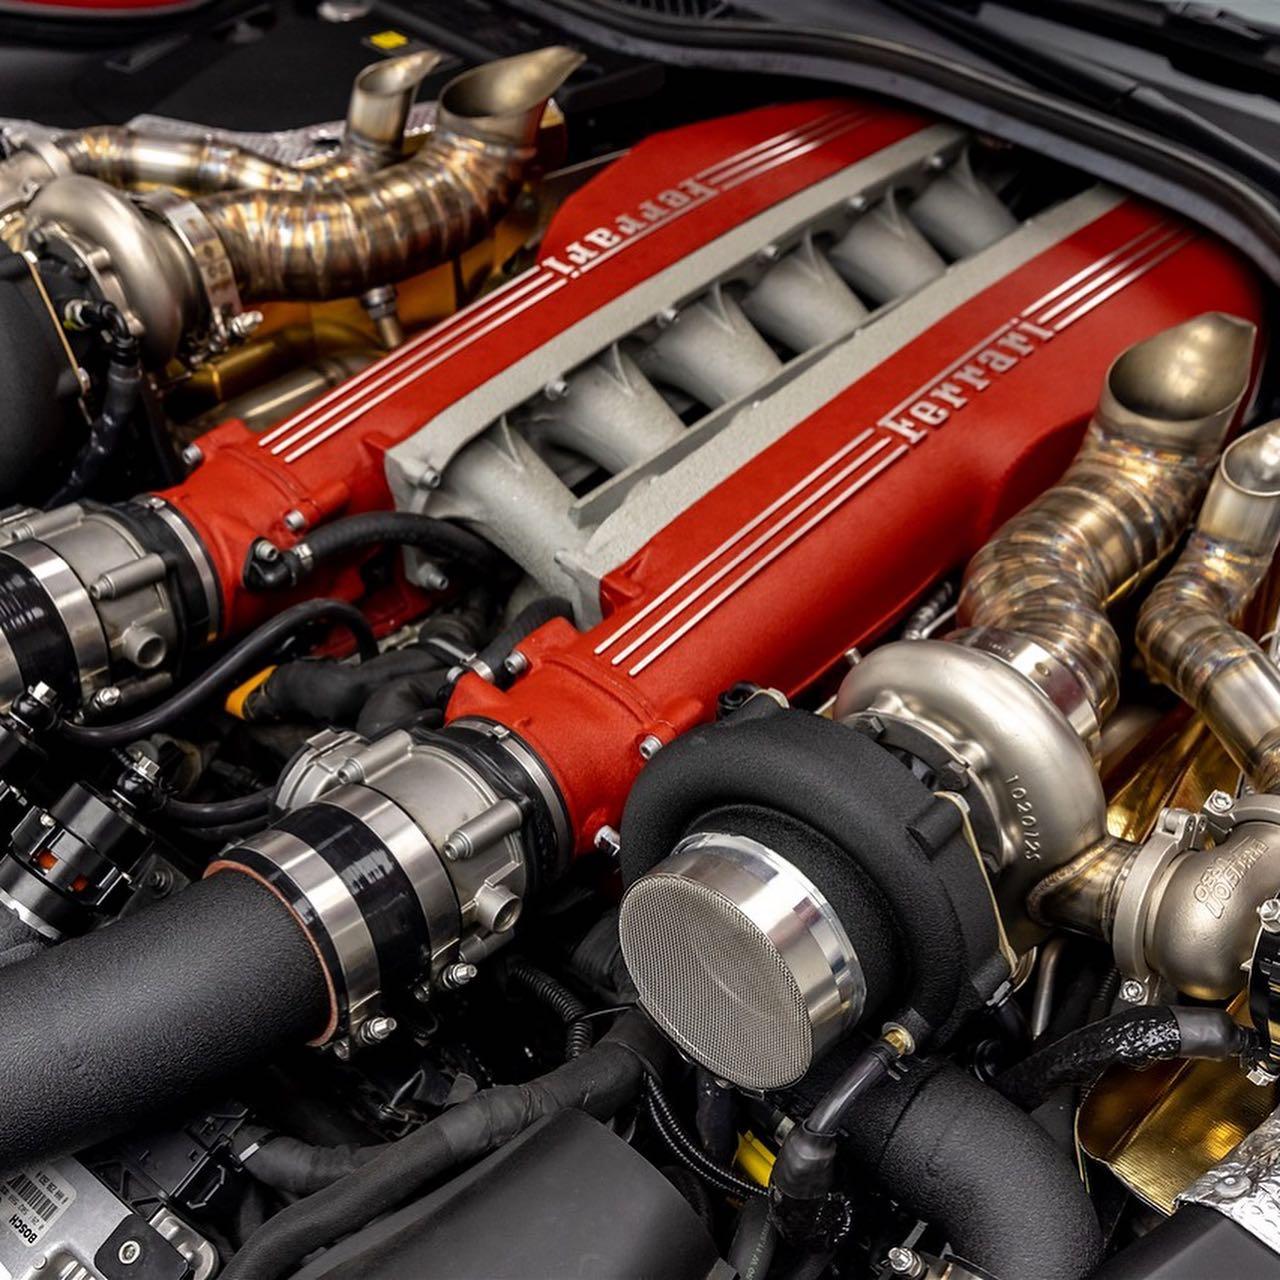 Twin-Turbo-Ferrari-F12-Berlinetta-by-Daily-Driven-Exotics-13